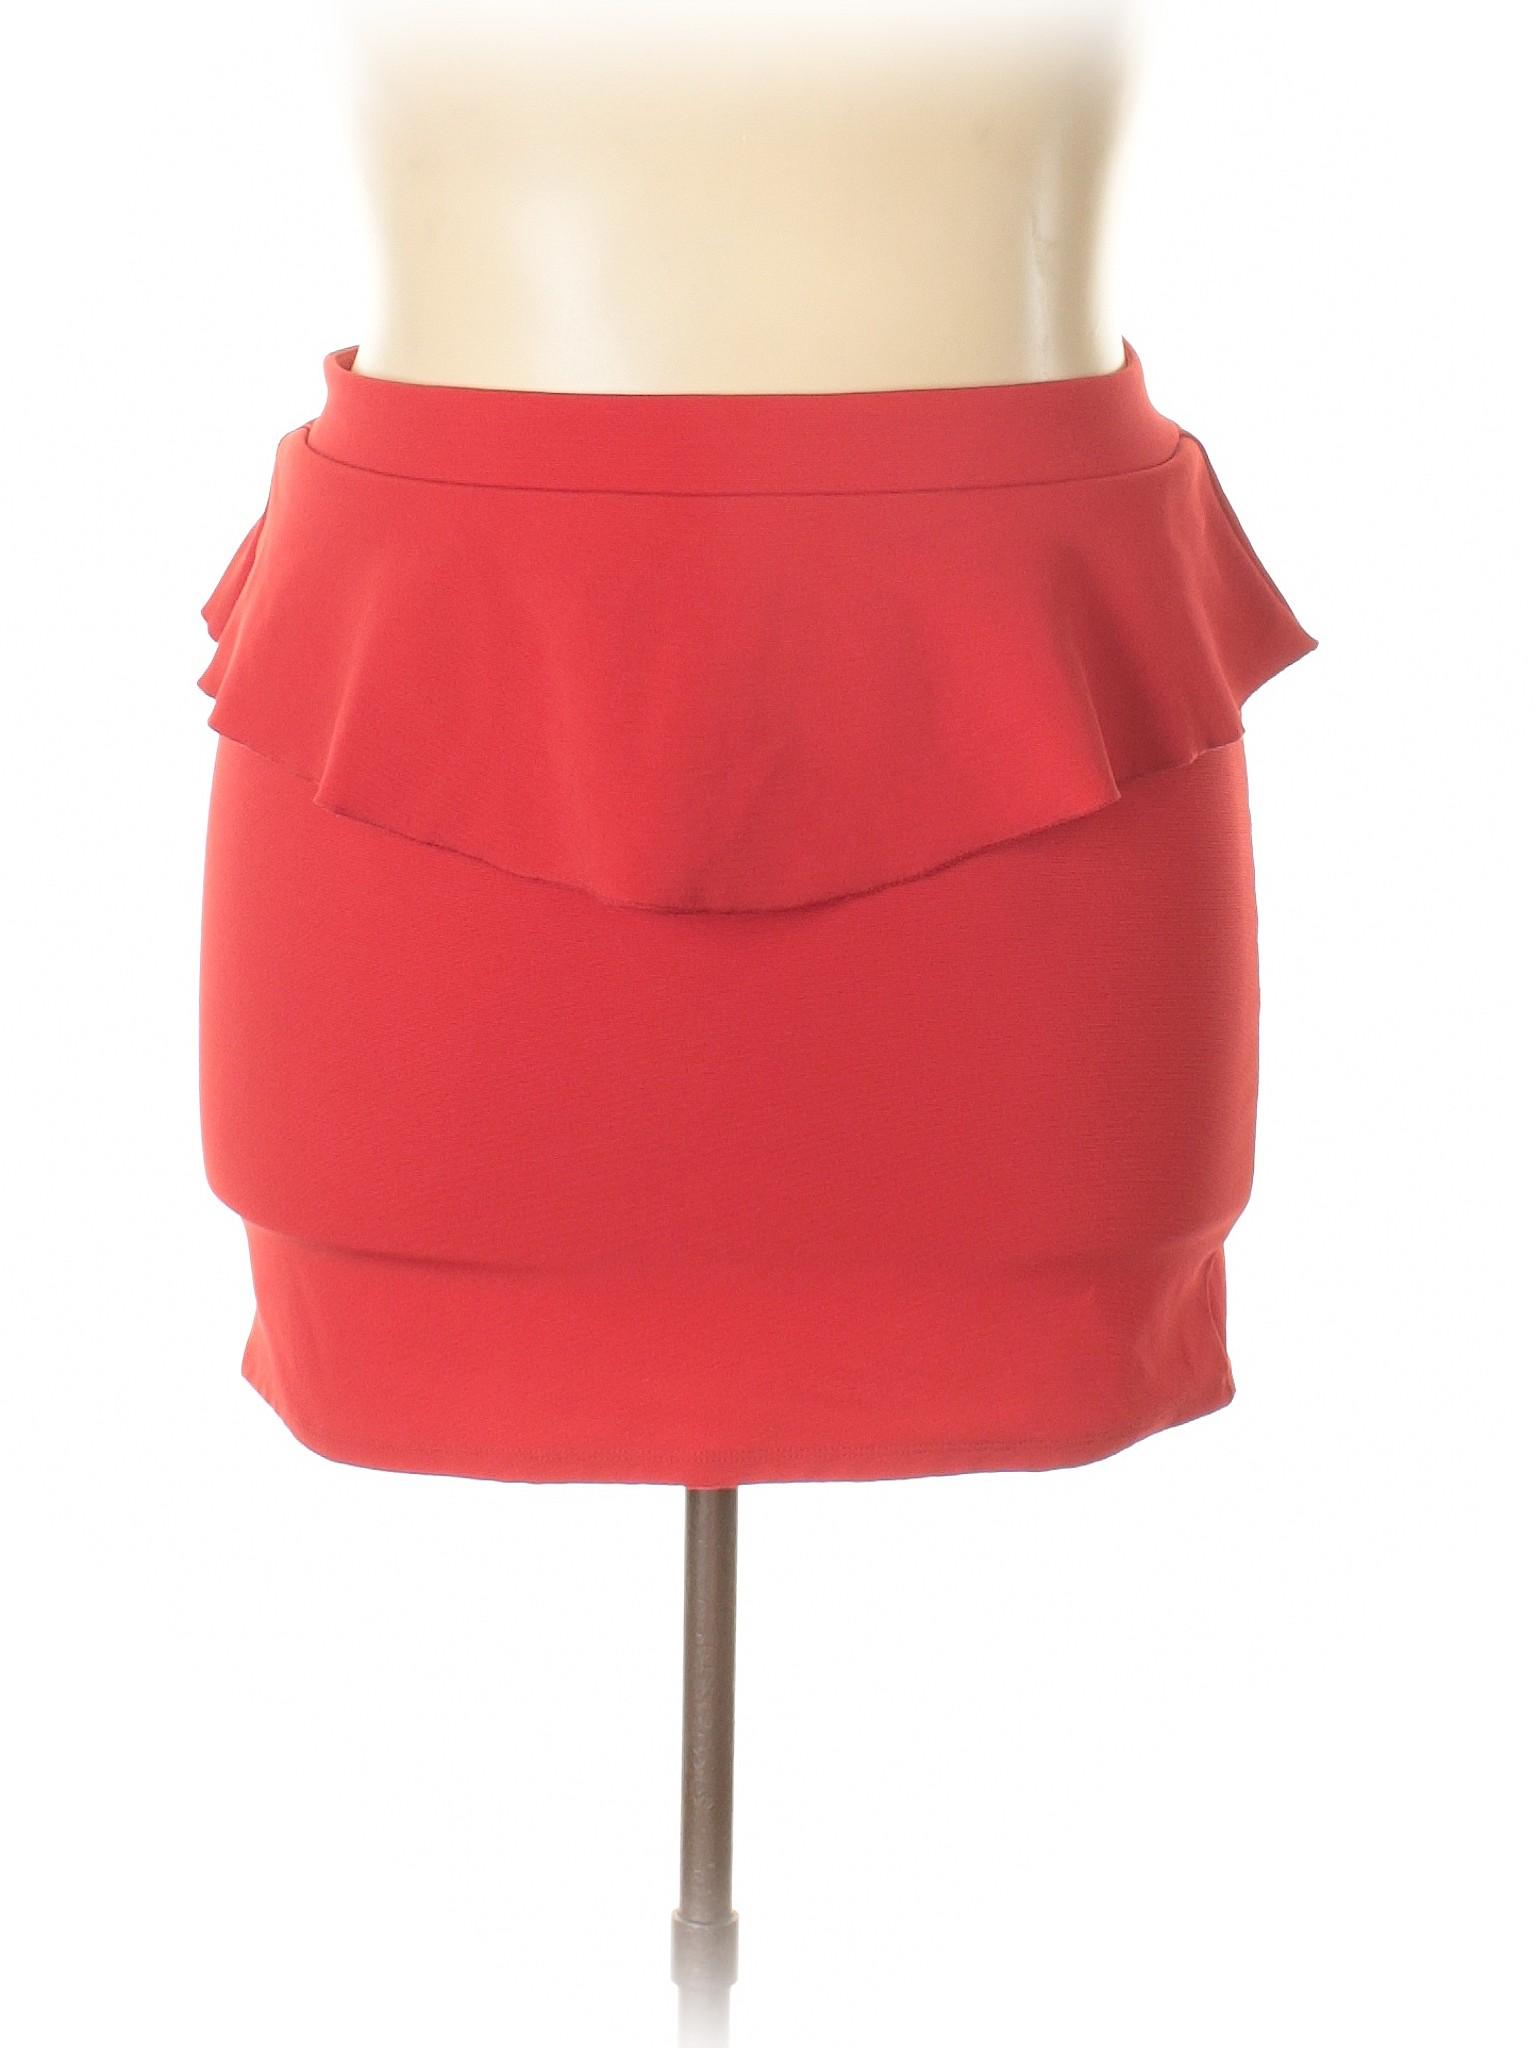 Casual Boutique Skirt Casual Boutique Casual Skirt Boutique Skirt Boutique Casual 77IRw